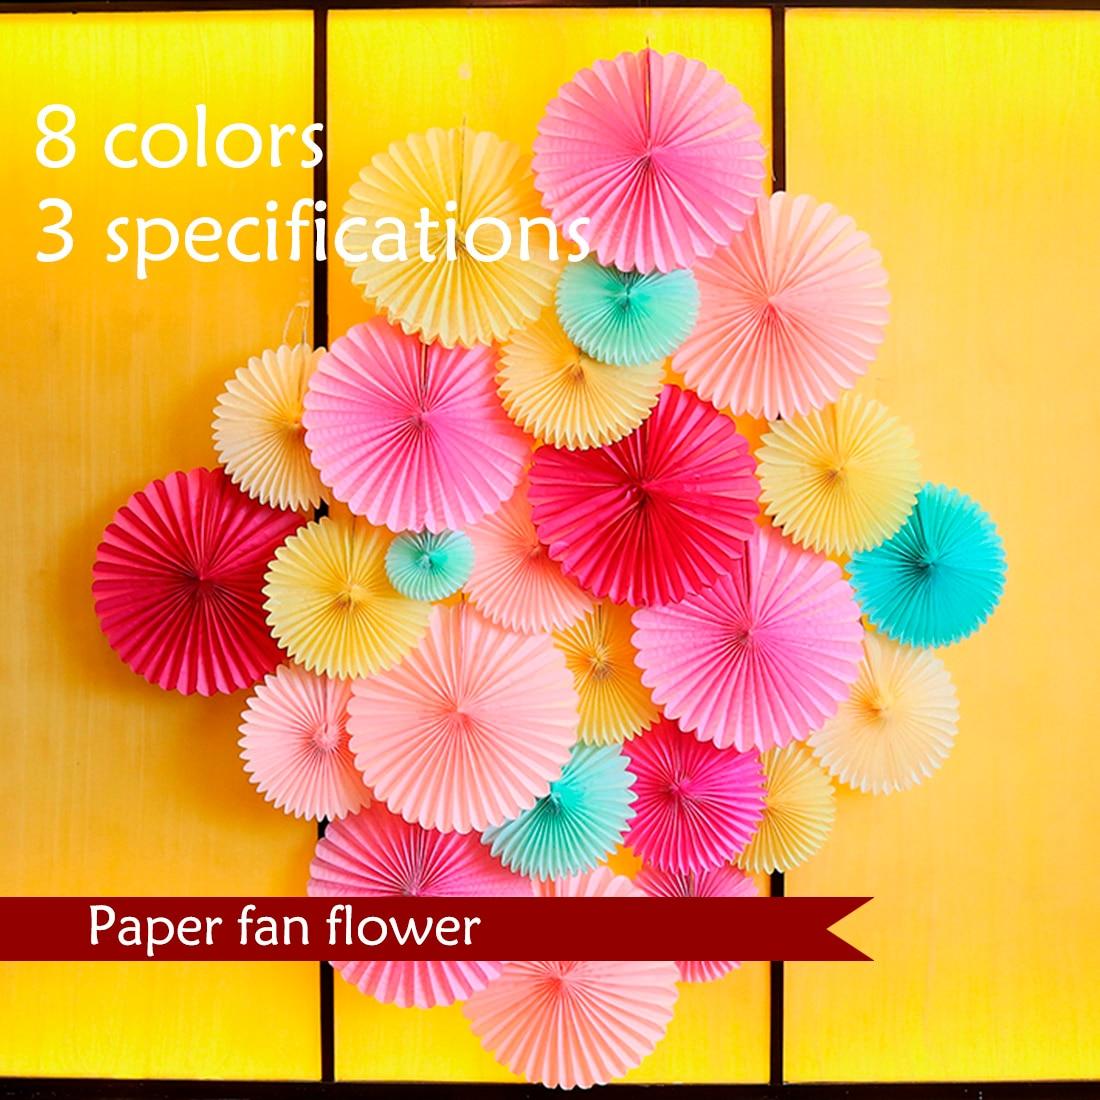 New 5pcs Tissue Paper Fan Diy Crafts Hanging Wedding: Tissue Paper Crafts Fans DIY Hanging Flowers Birthday